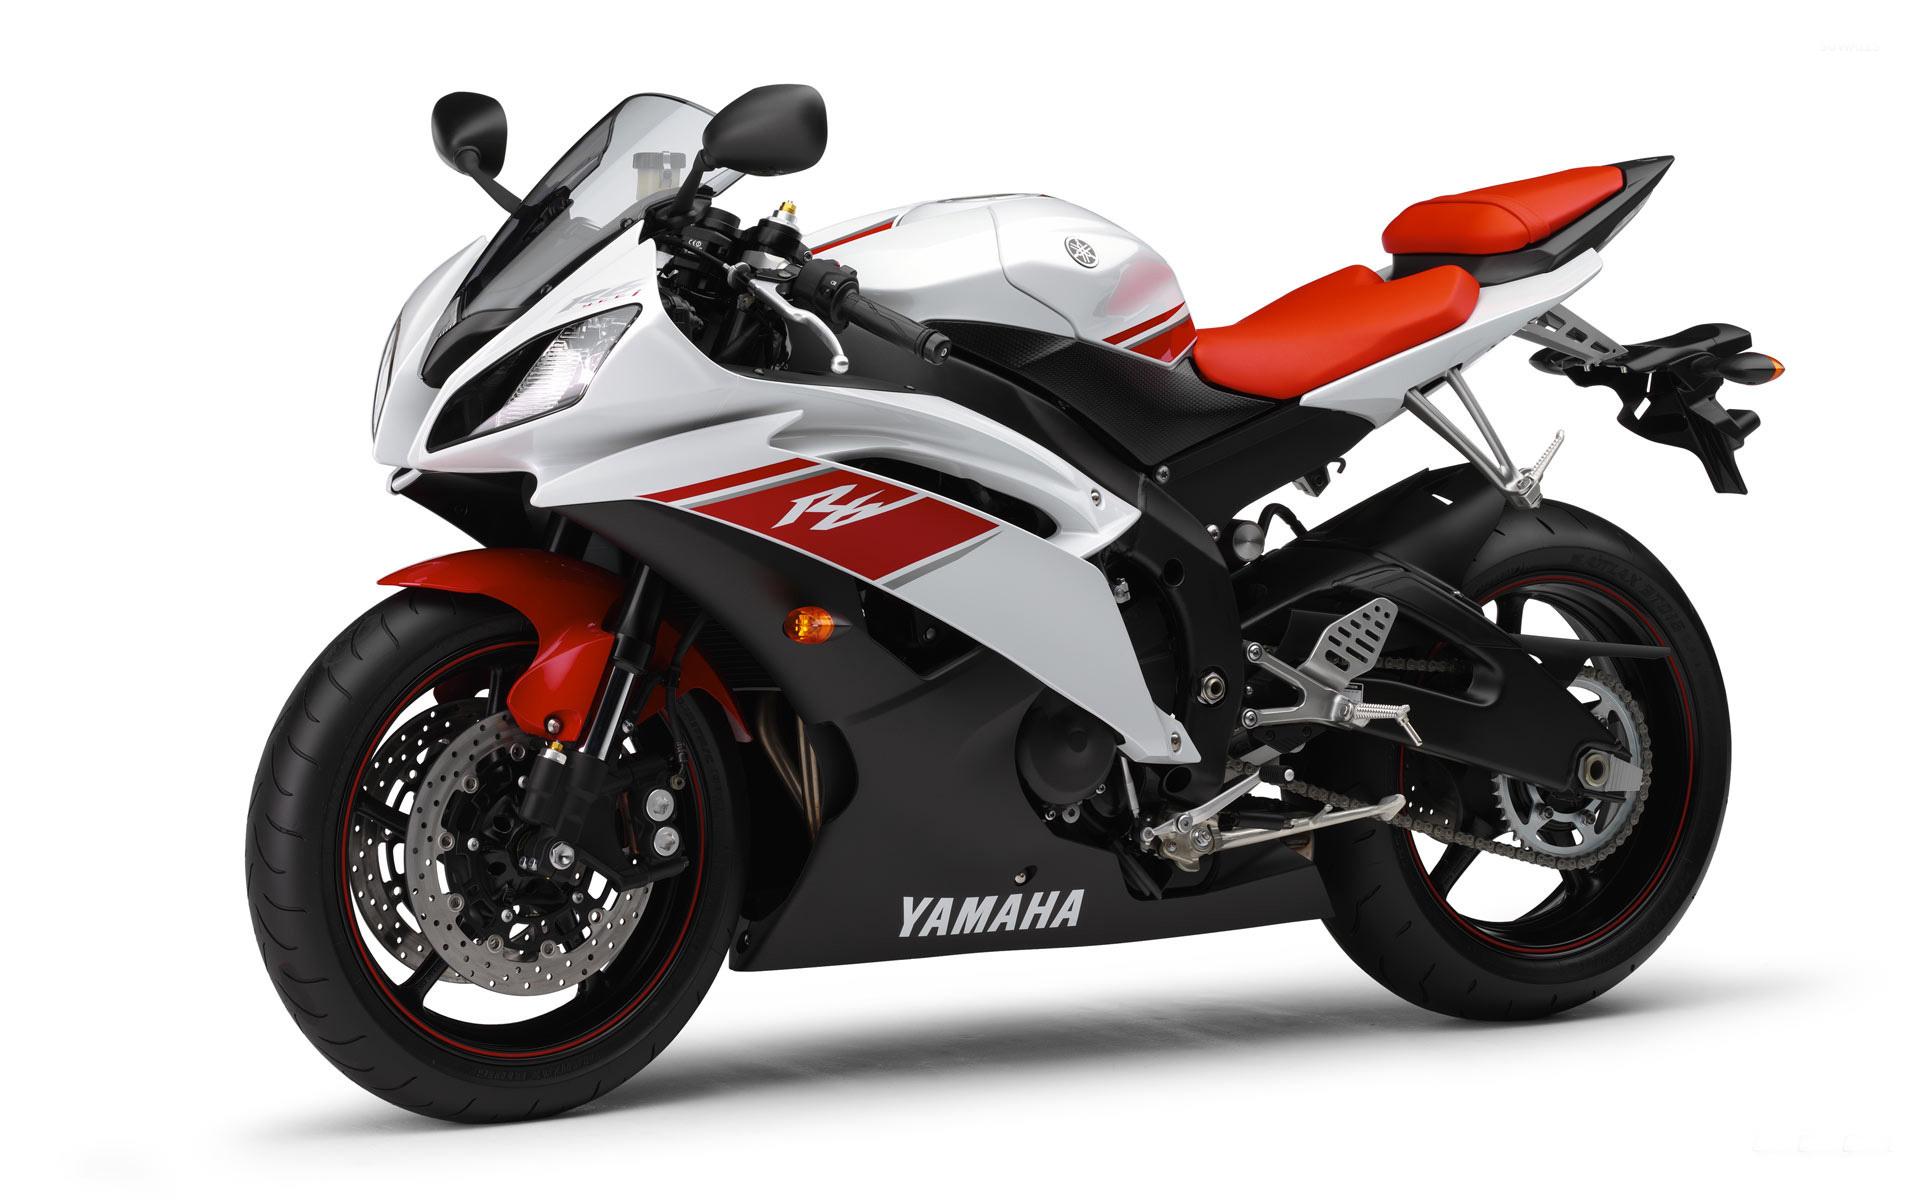 Yamaha-YZF-R6-HD-Wallpapers | Ultra HD Motorcycles Wallpapers ...